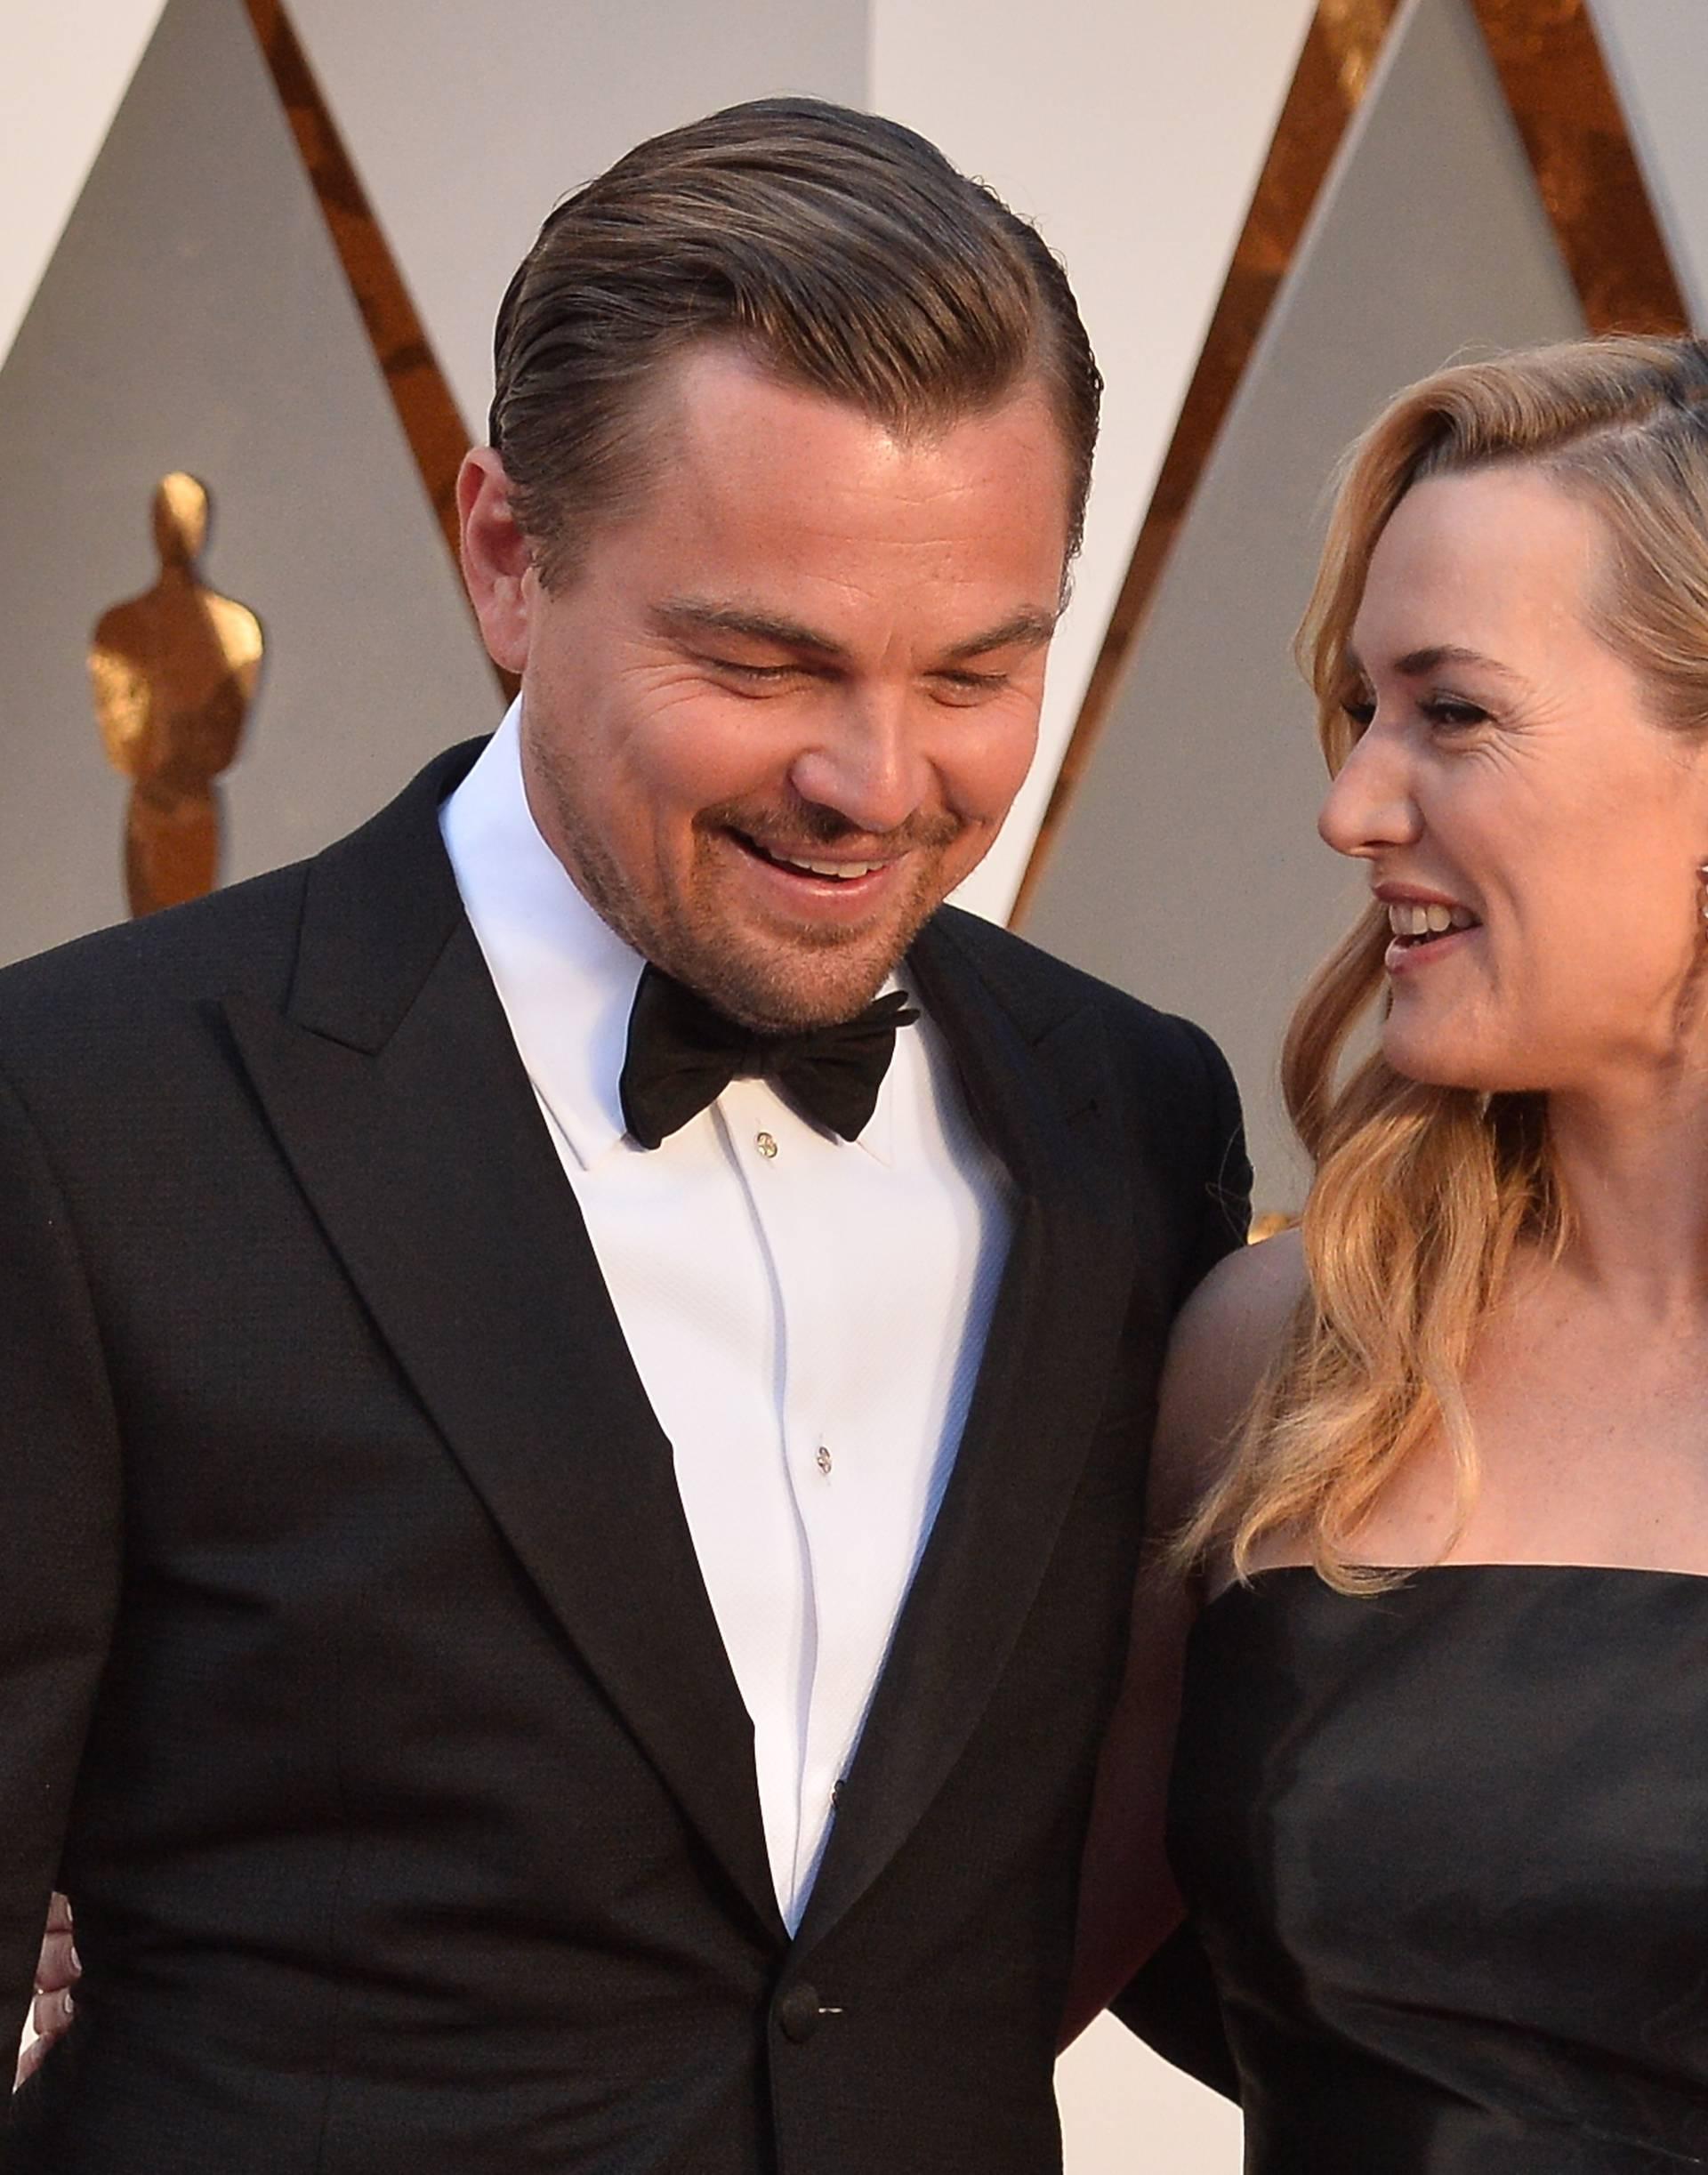 88th Academy Awards - Arrivals - LA